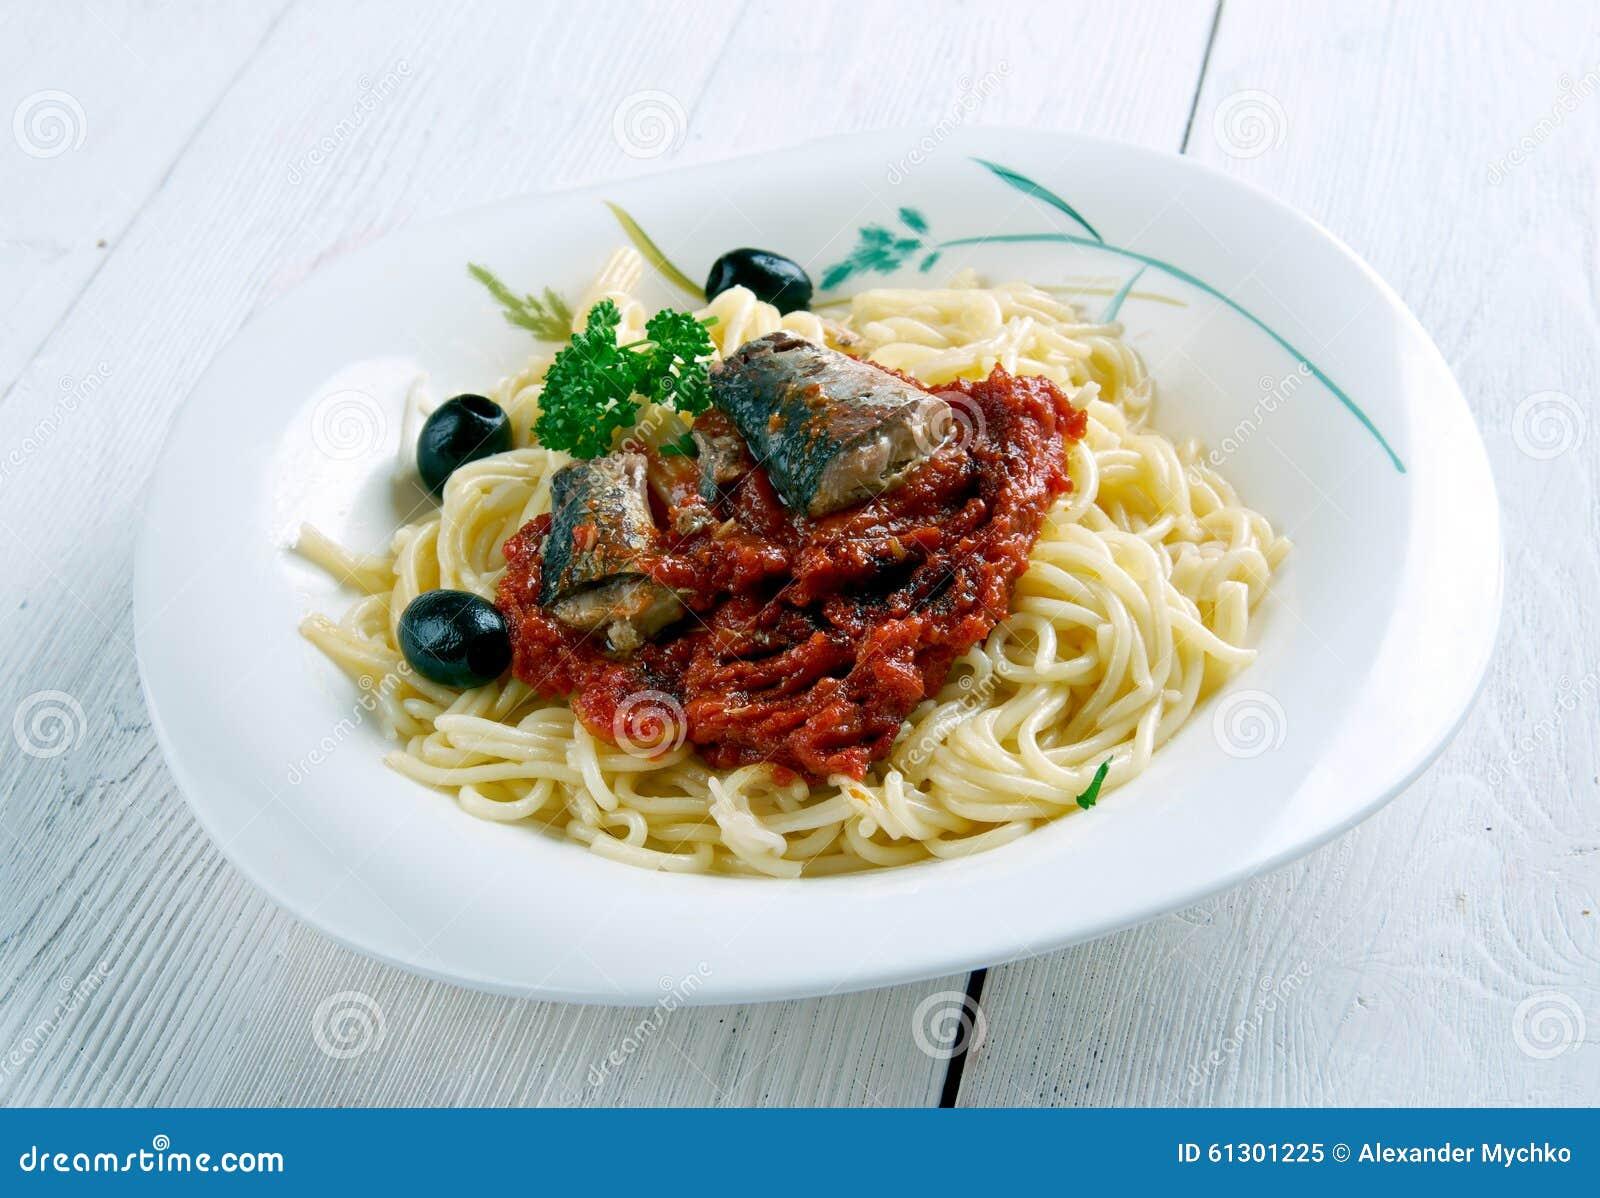 Pasta con le sarde - Sicilian dish of pasta with sardines.